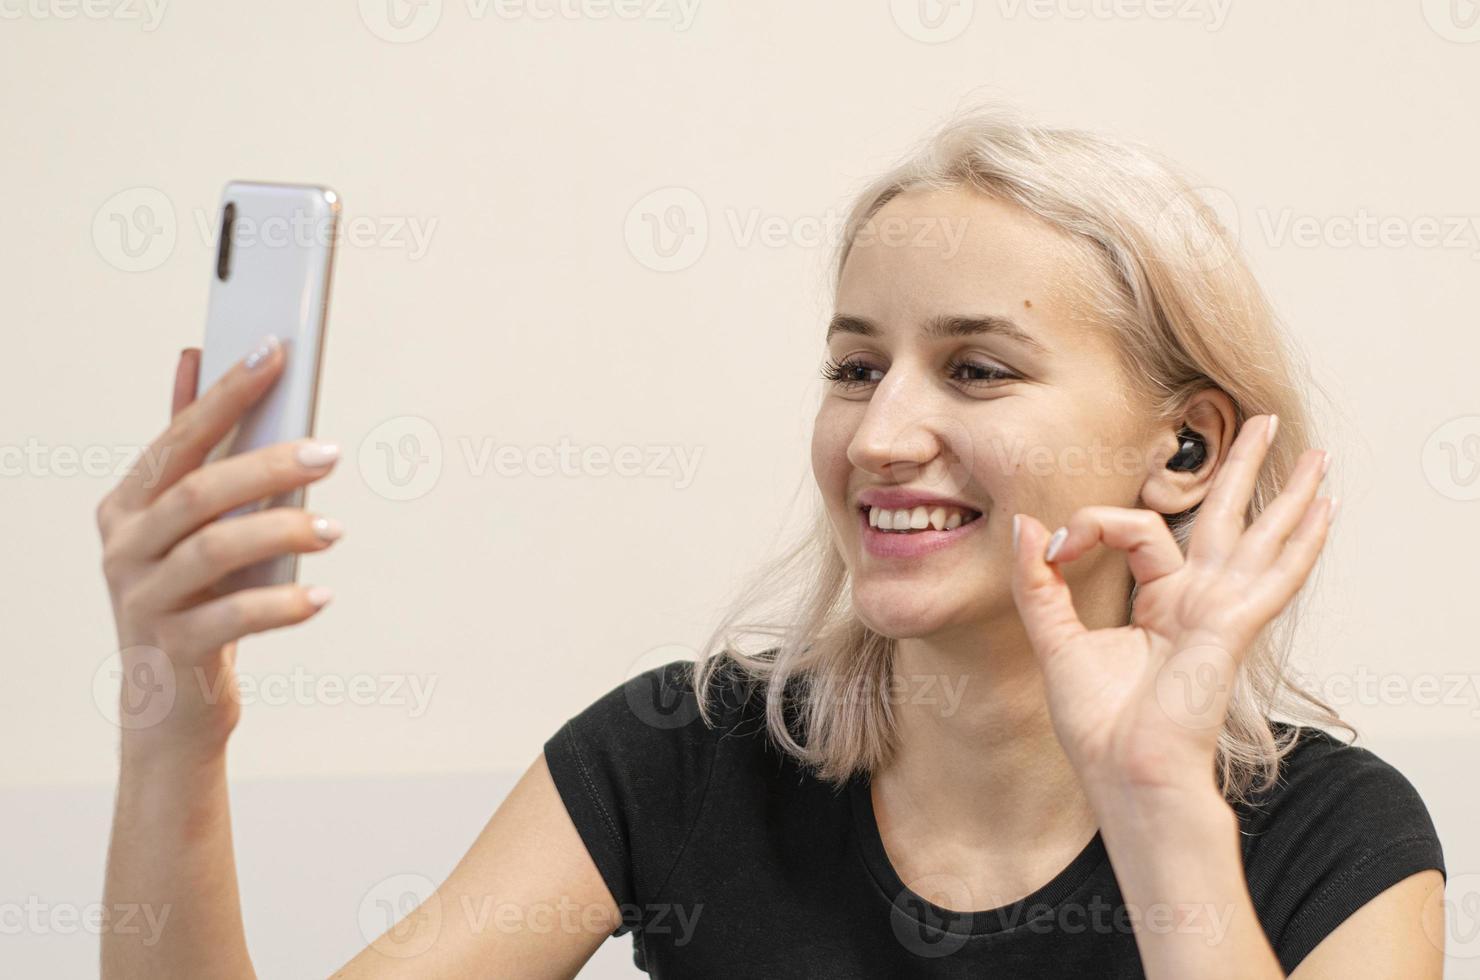 chica se comunica por videollamada. audífonos inalámbricos. foto